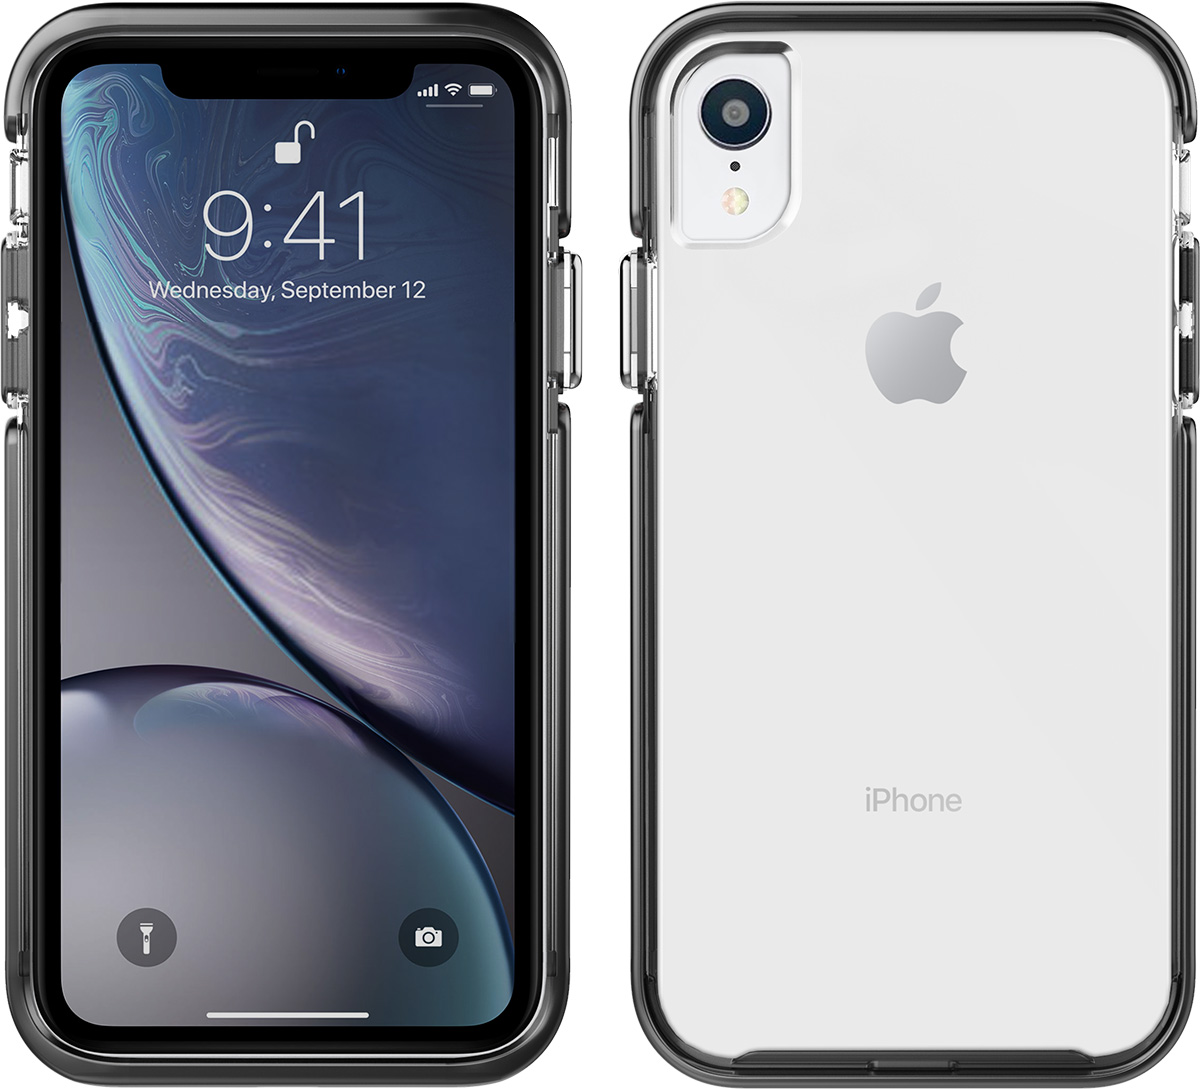 pelican apple iphone c42130 ambassador silver phone case